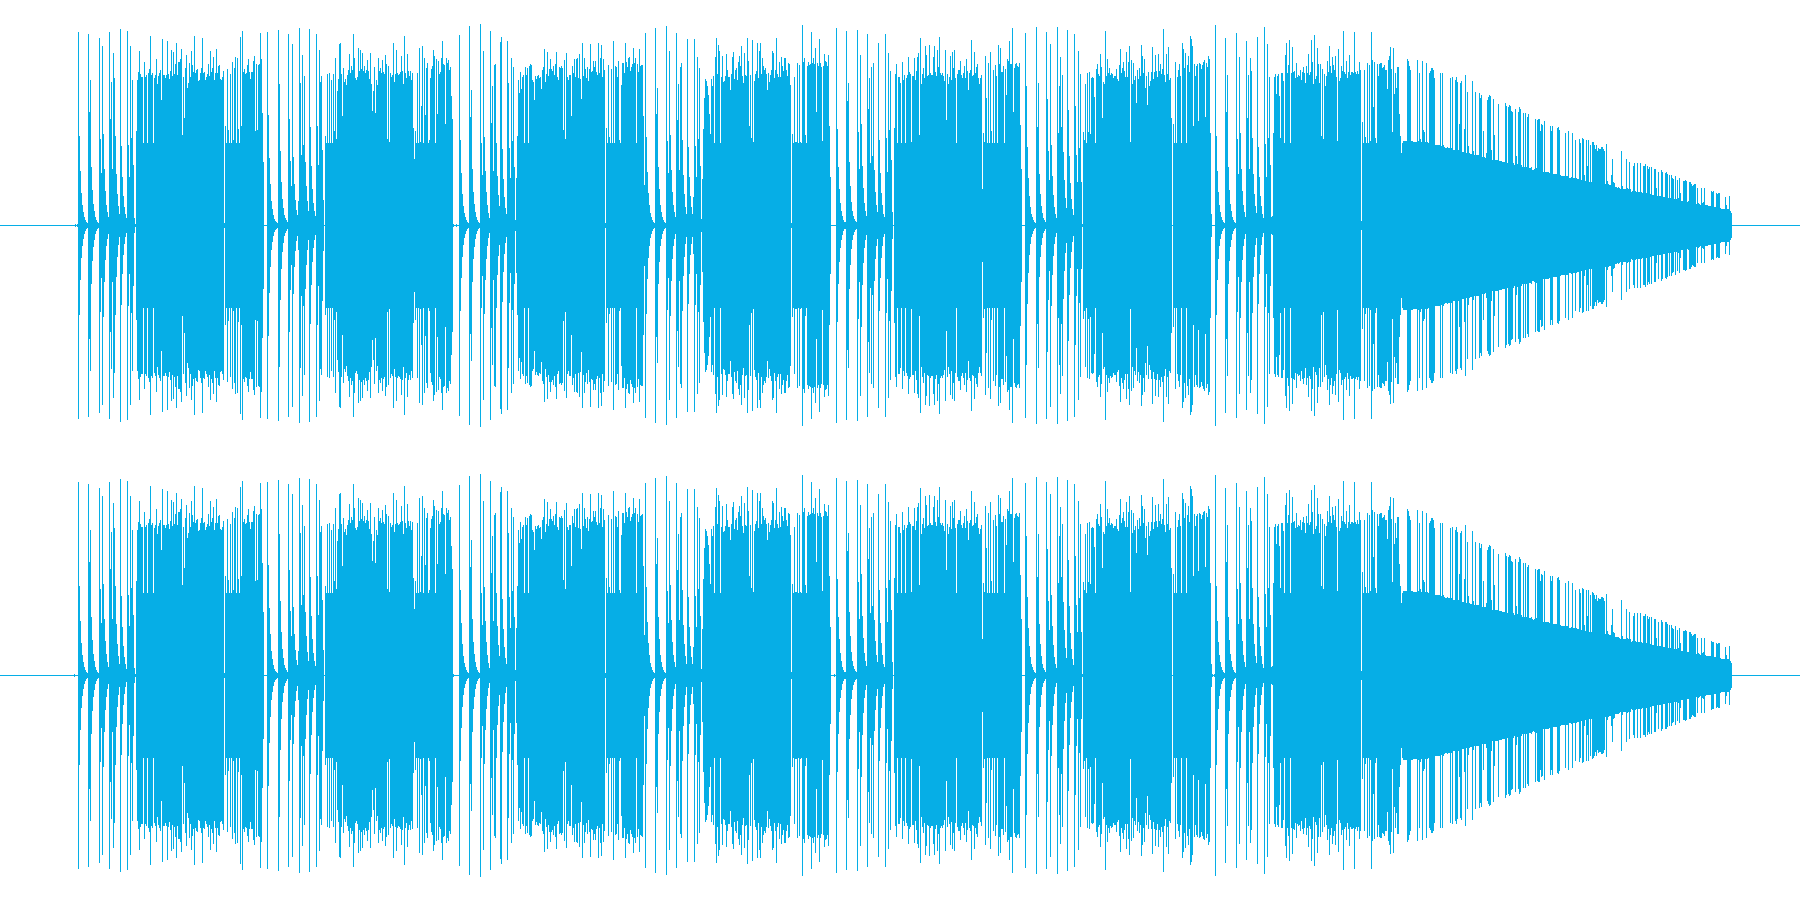 GB シューティング01-05(ダメージの再生済みの波形